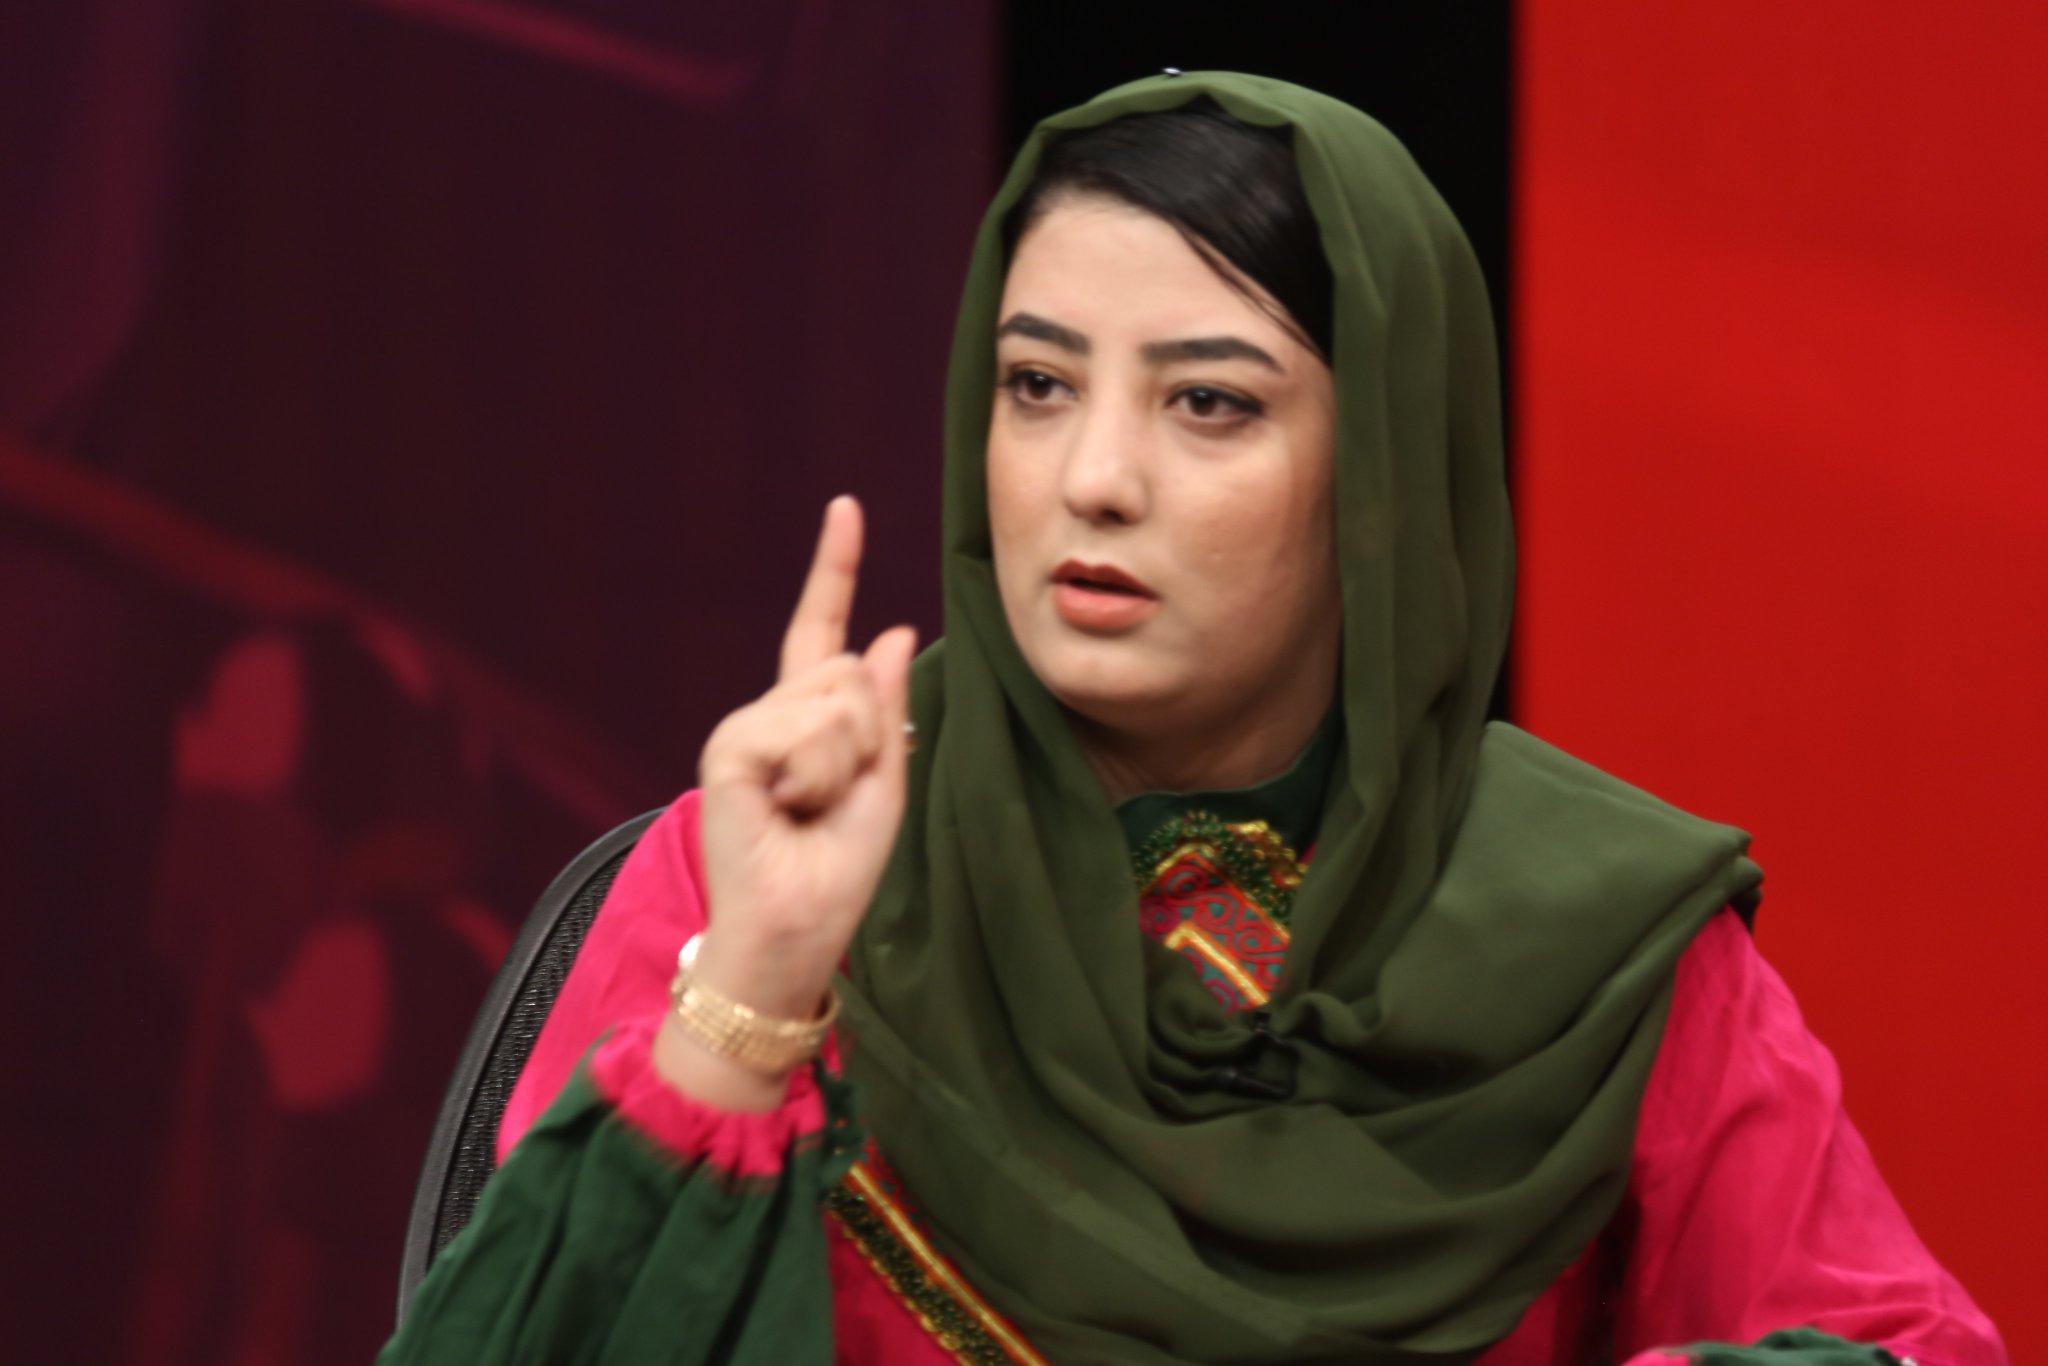 "Open Jirga on Twitter: ""شګوفه نورزۍ: د #هلمند په هغه ولسوالیو کې چې د نشه  يي توکو کښت او تولید کیږي، ډ هلمند تر نورو سیمو ډېرې #ناامنه دي. #افغانستان  #مواد #مخدر @"